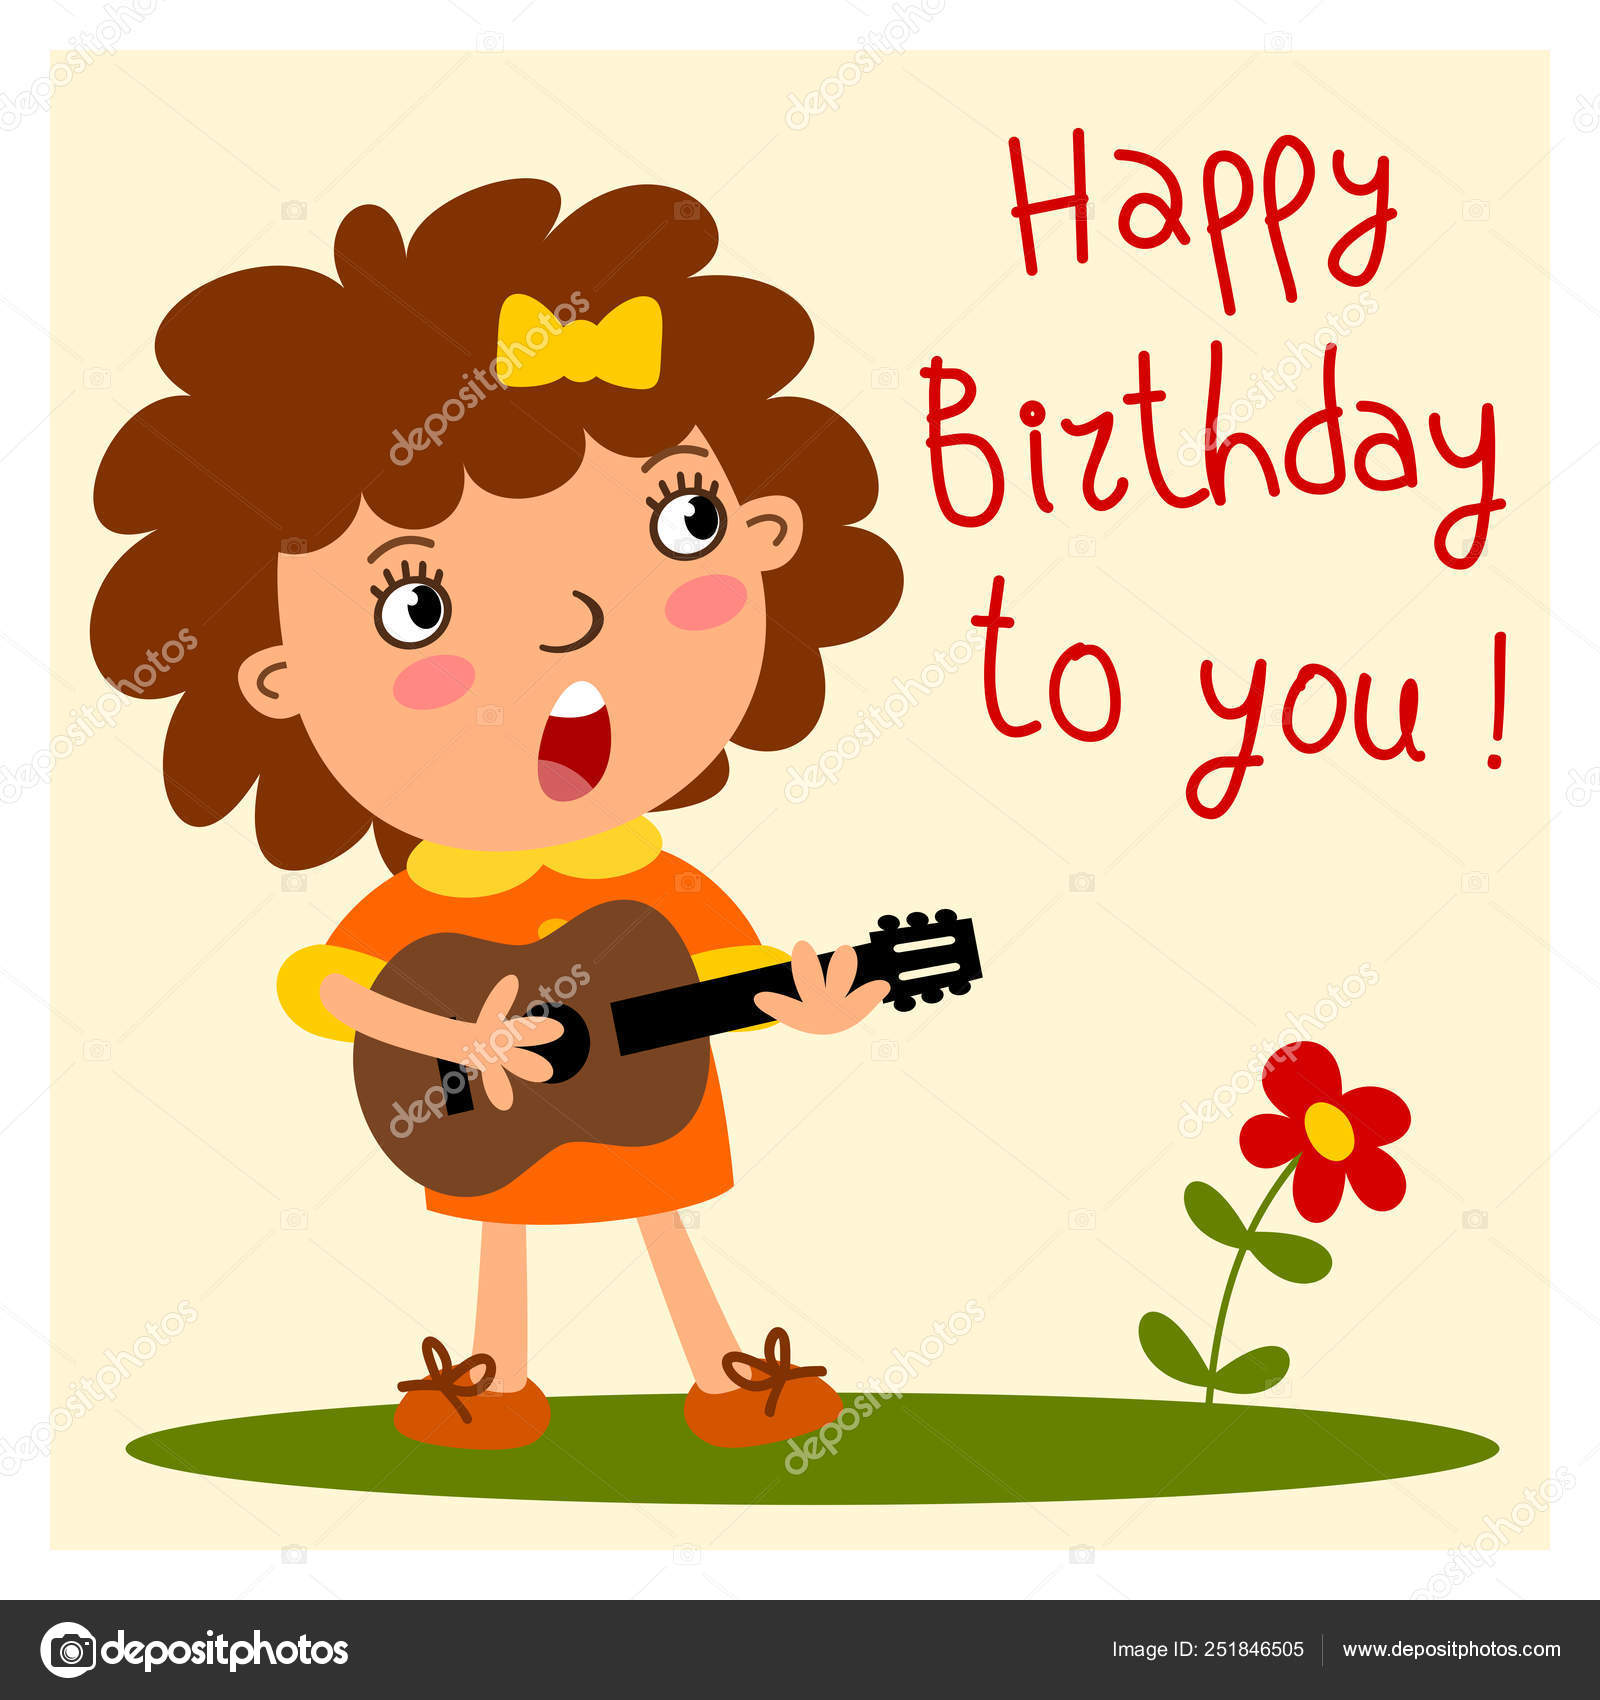 Illustrations Happy Birthday Guitar Funny Girl Guitar Cartoon Style Sings Song Happy Birthday You Stock Vector C Dmitriy D 251846505